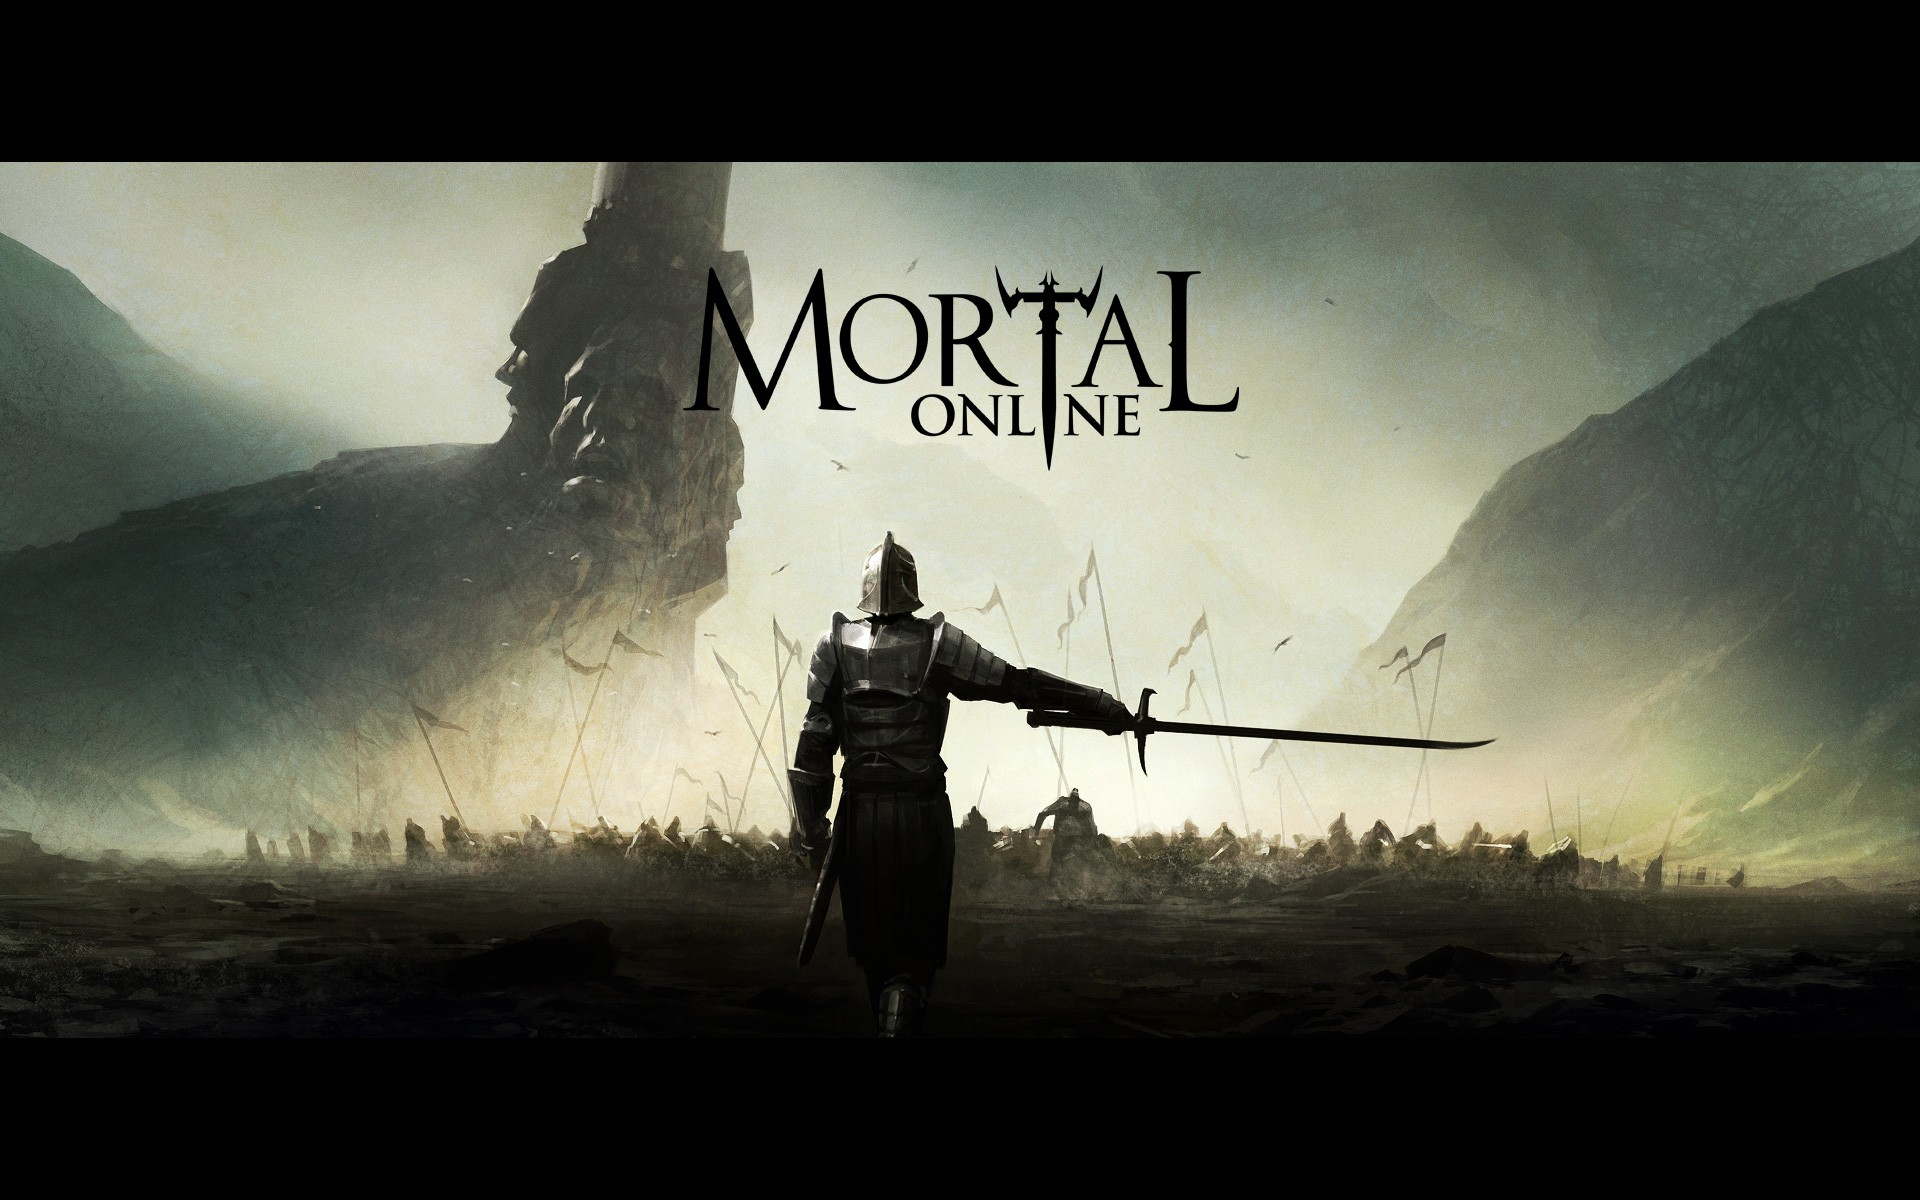 Mortal Online - 1920x1200